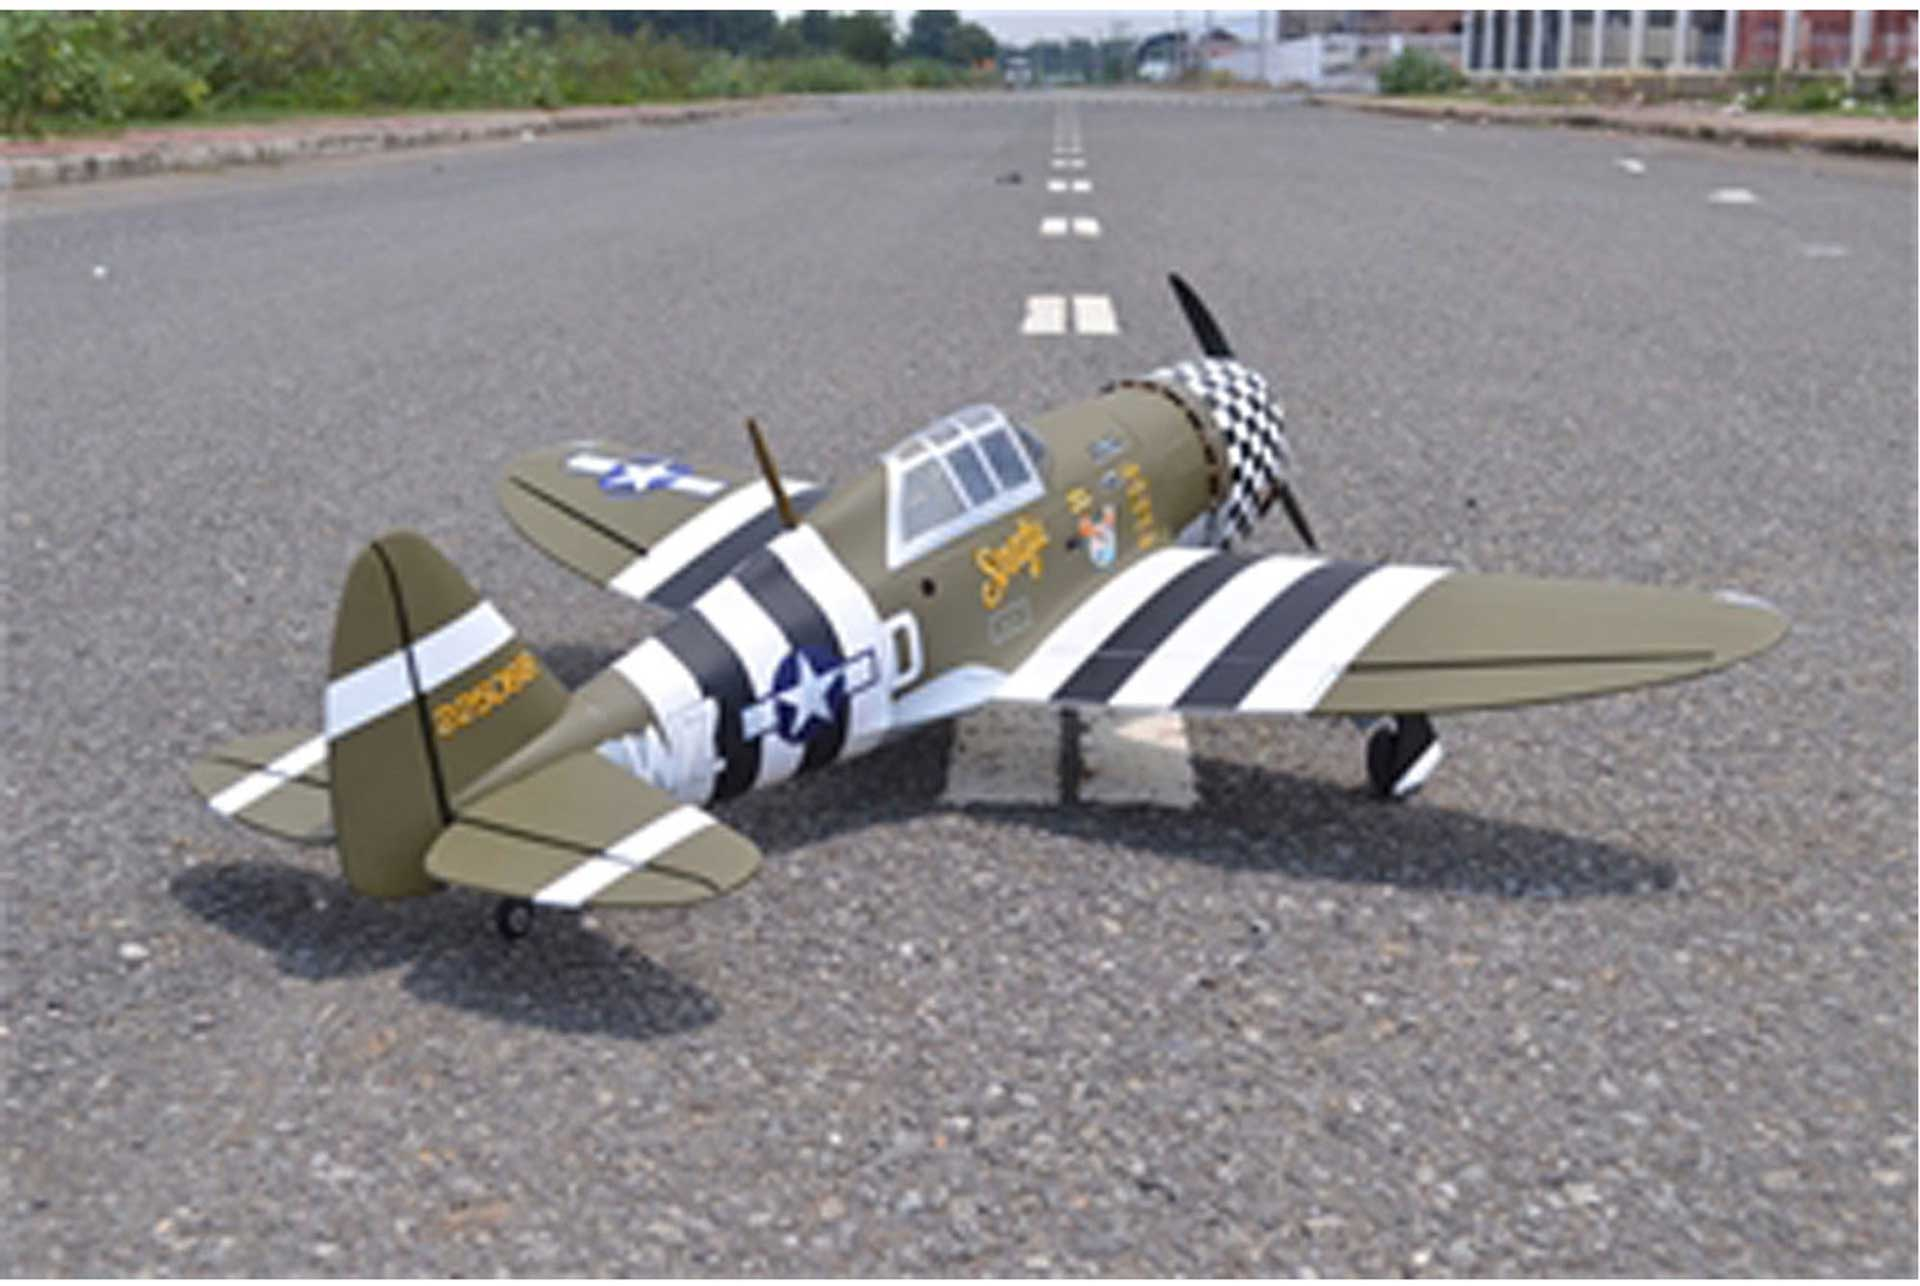 SG-MODELS P-47 THUNDERBOLT MASTER SCALE KIT EDITION HOLZBAUSATZ 1,6M